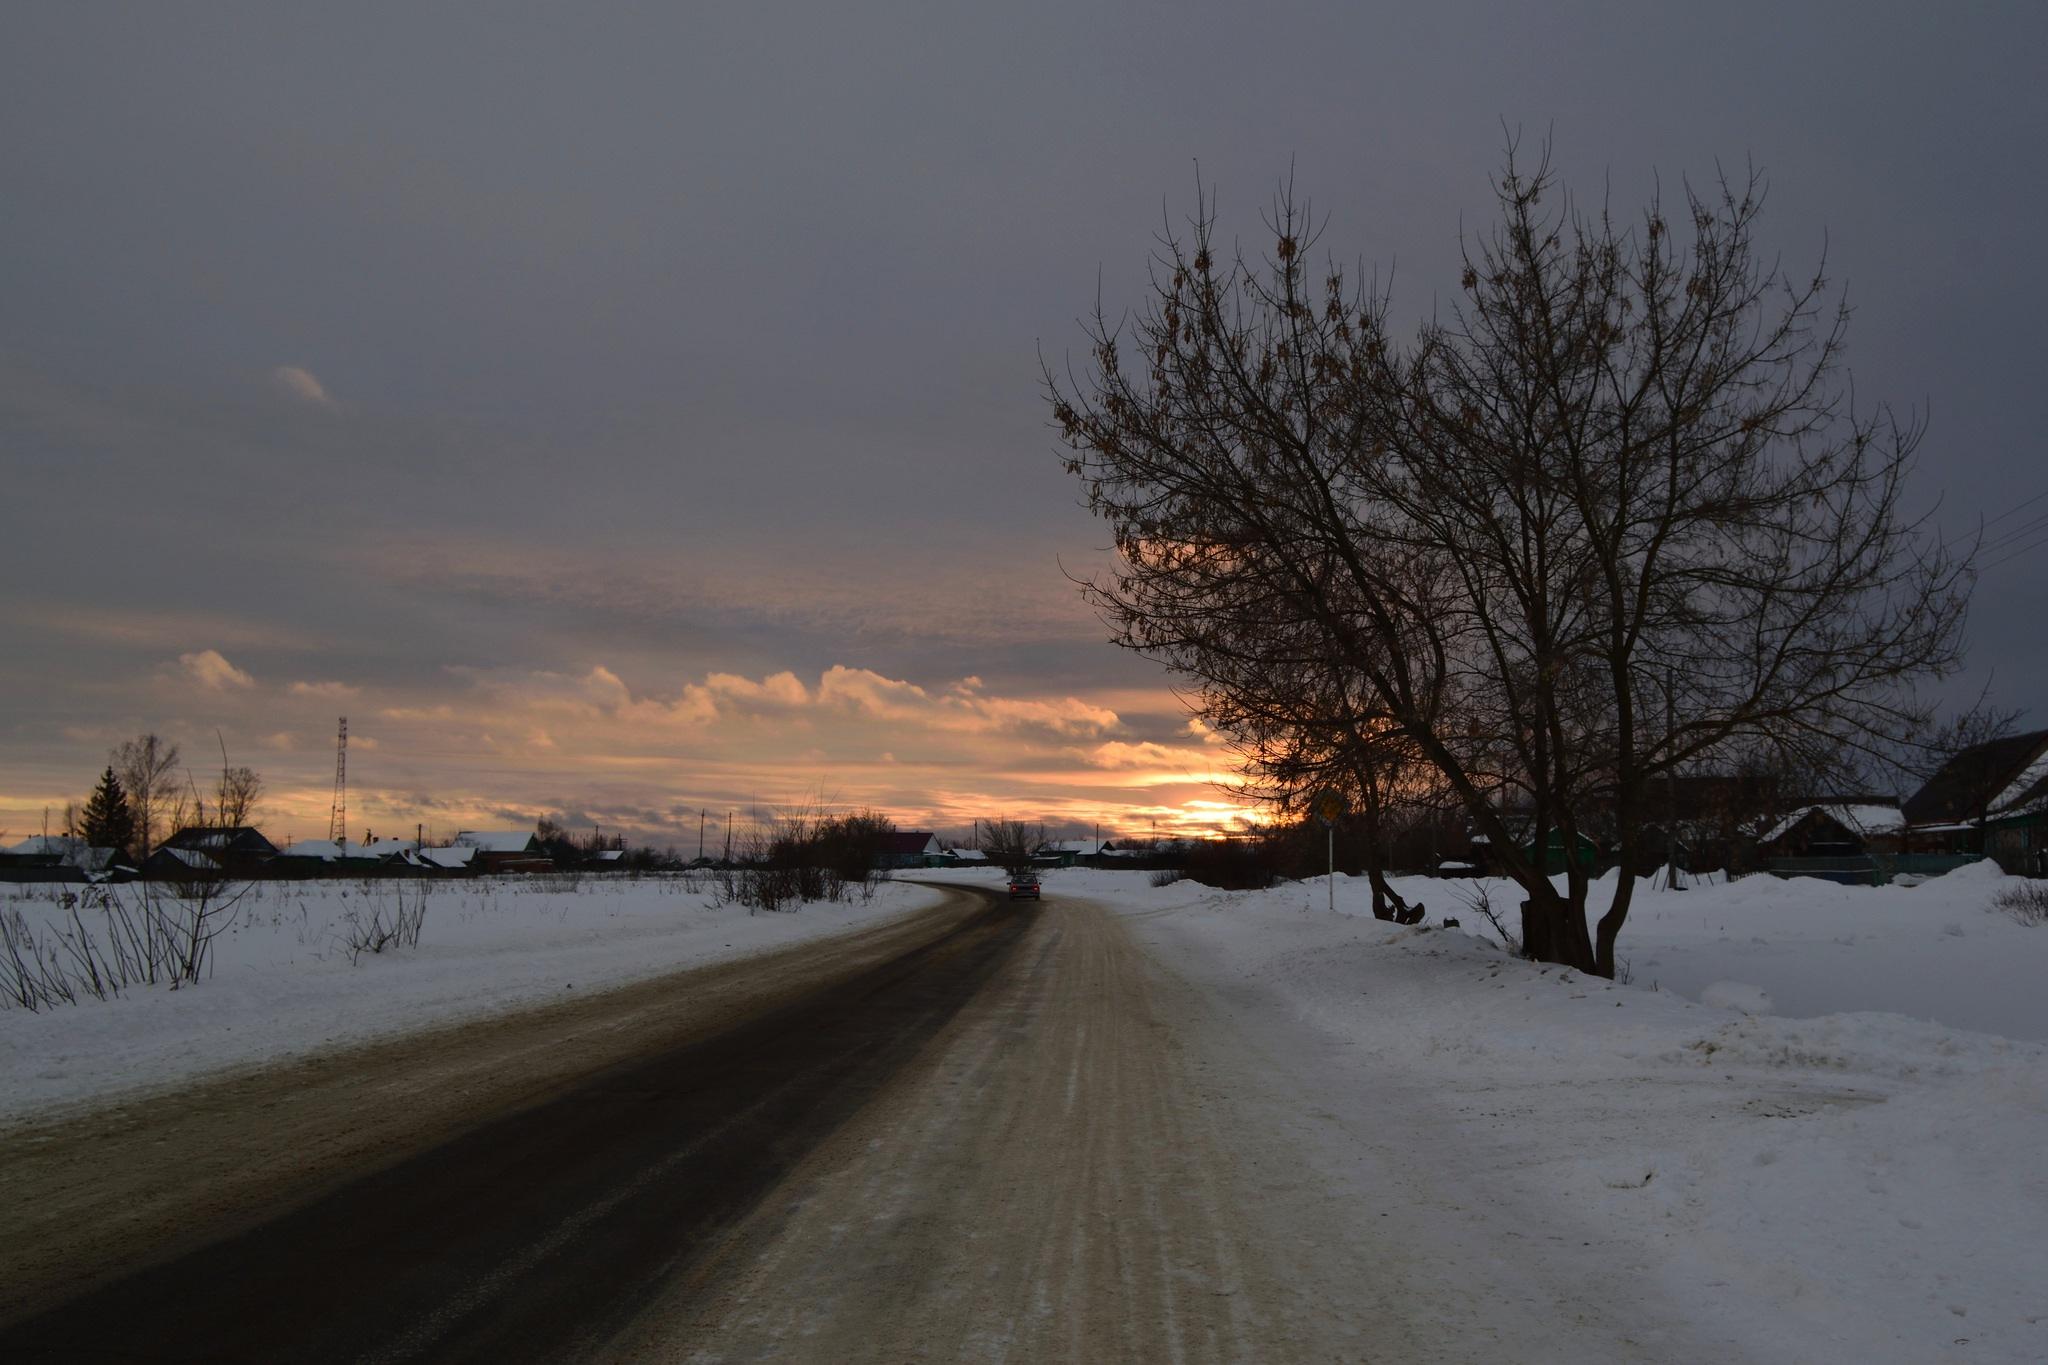 Rural evening. by Andrey Gordeeff